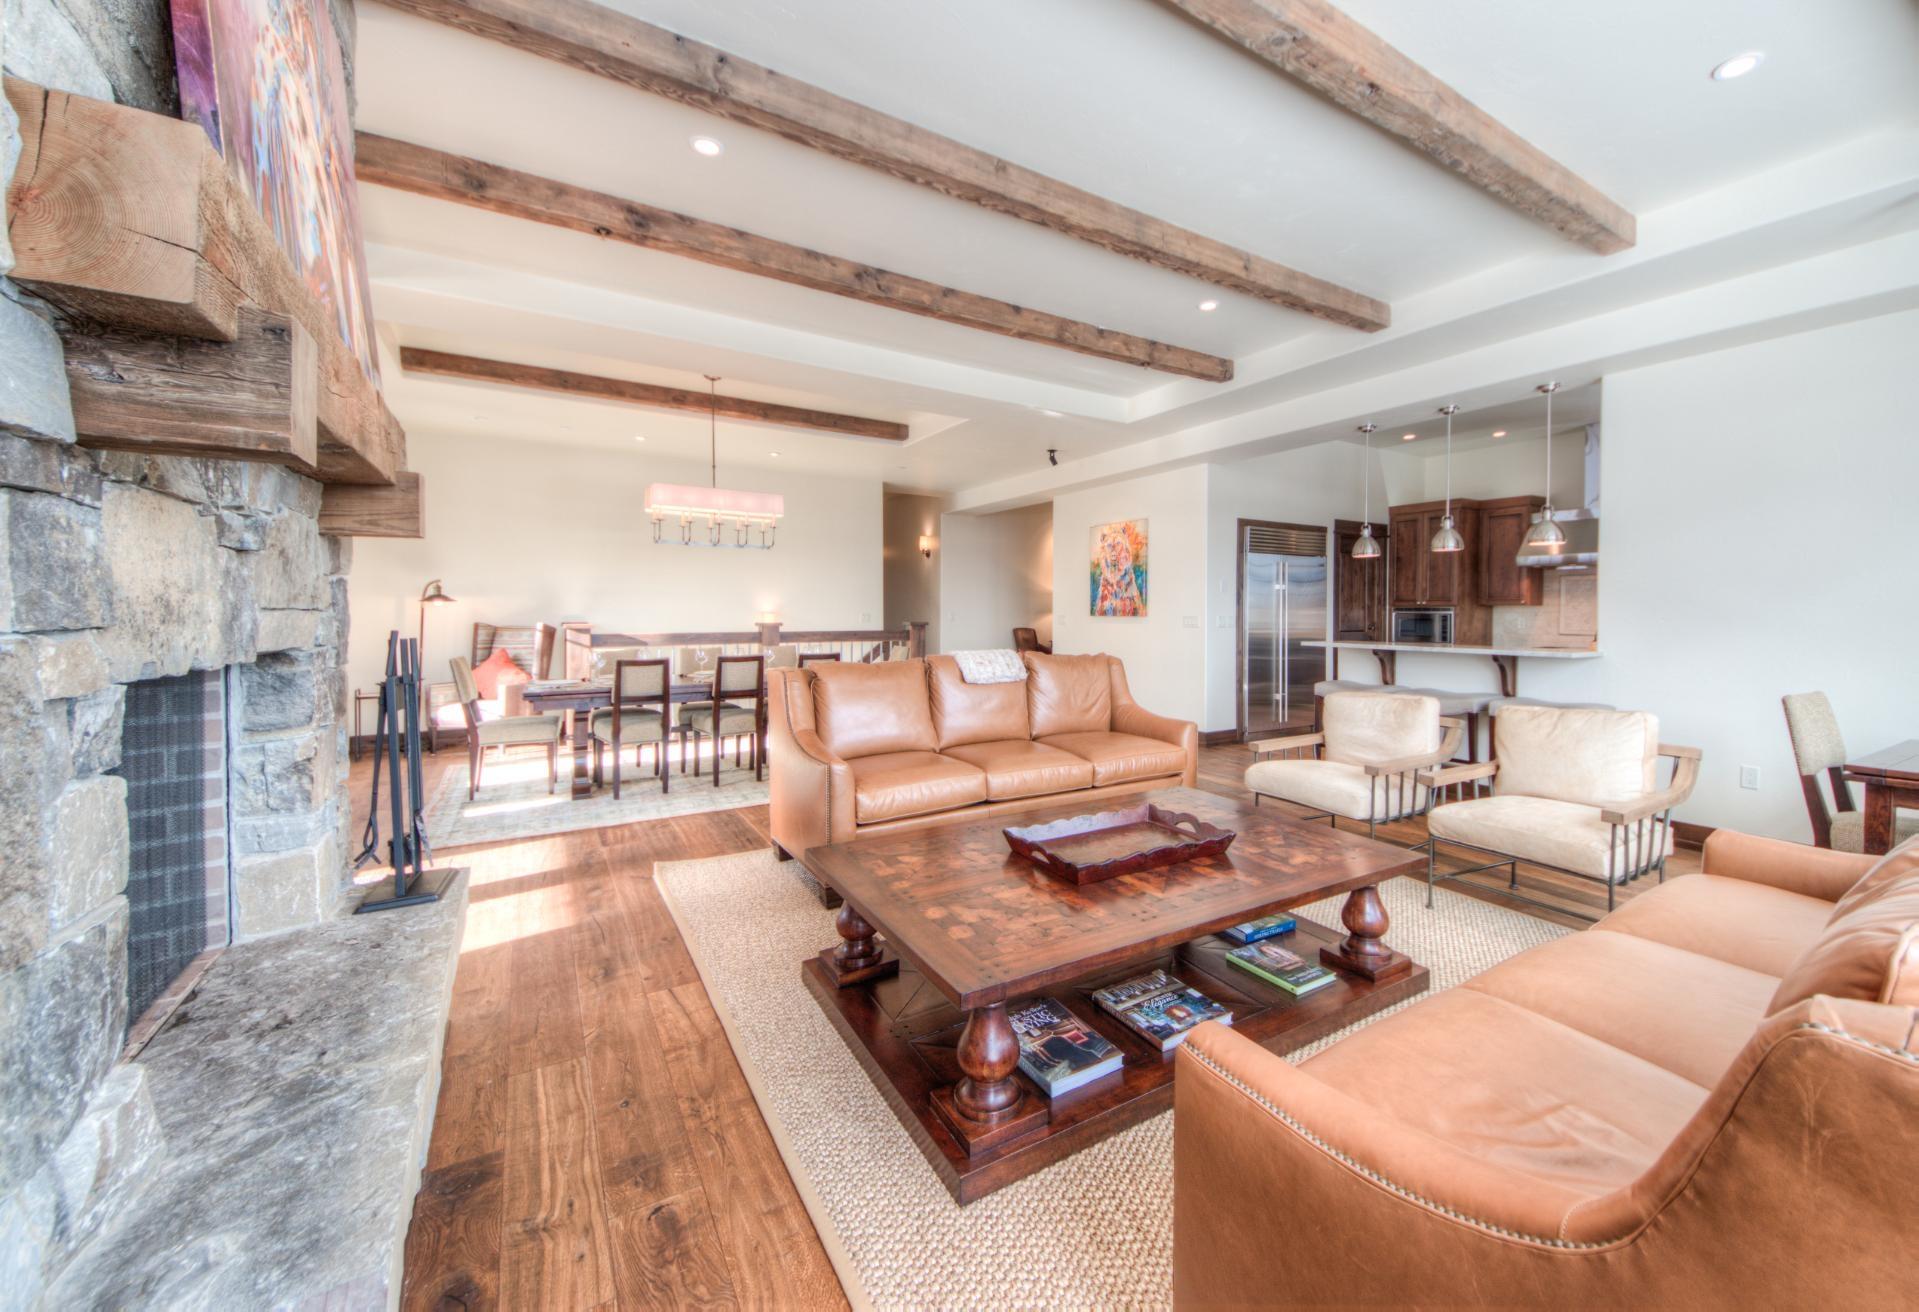 Luxury vacation rentals usa - Montana - Big sky - Cowboy heaven - 7B - Image 1/25